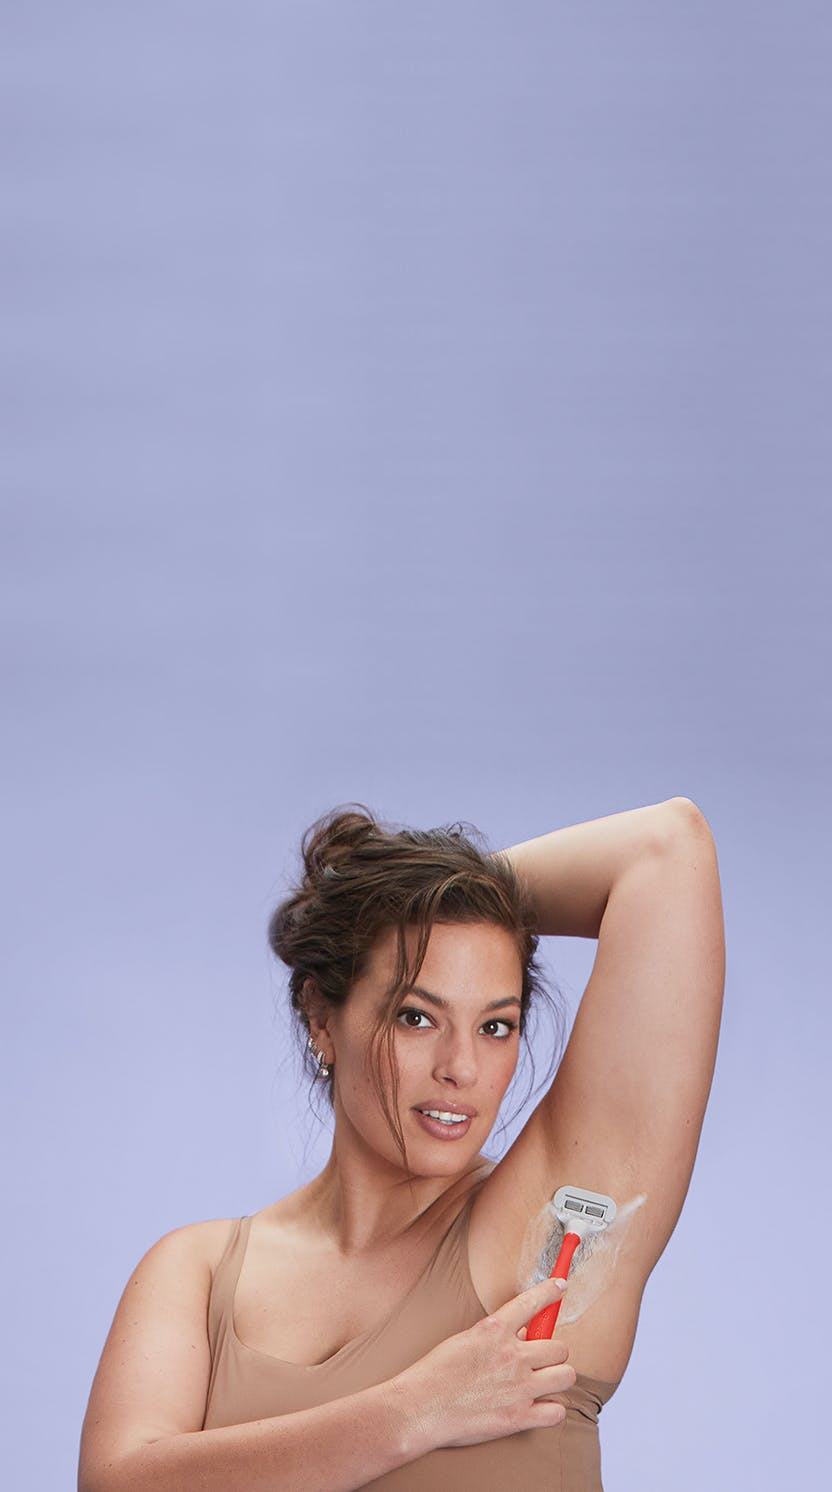 Ashley Graham shaving her armpit